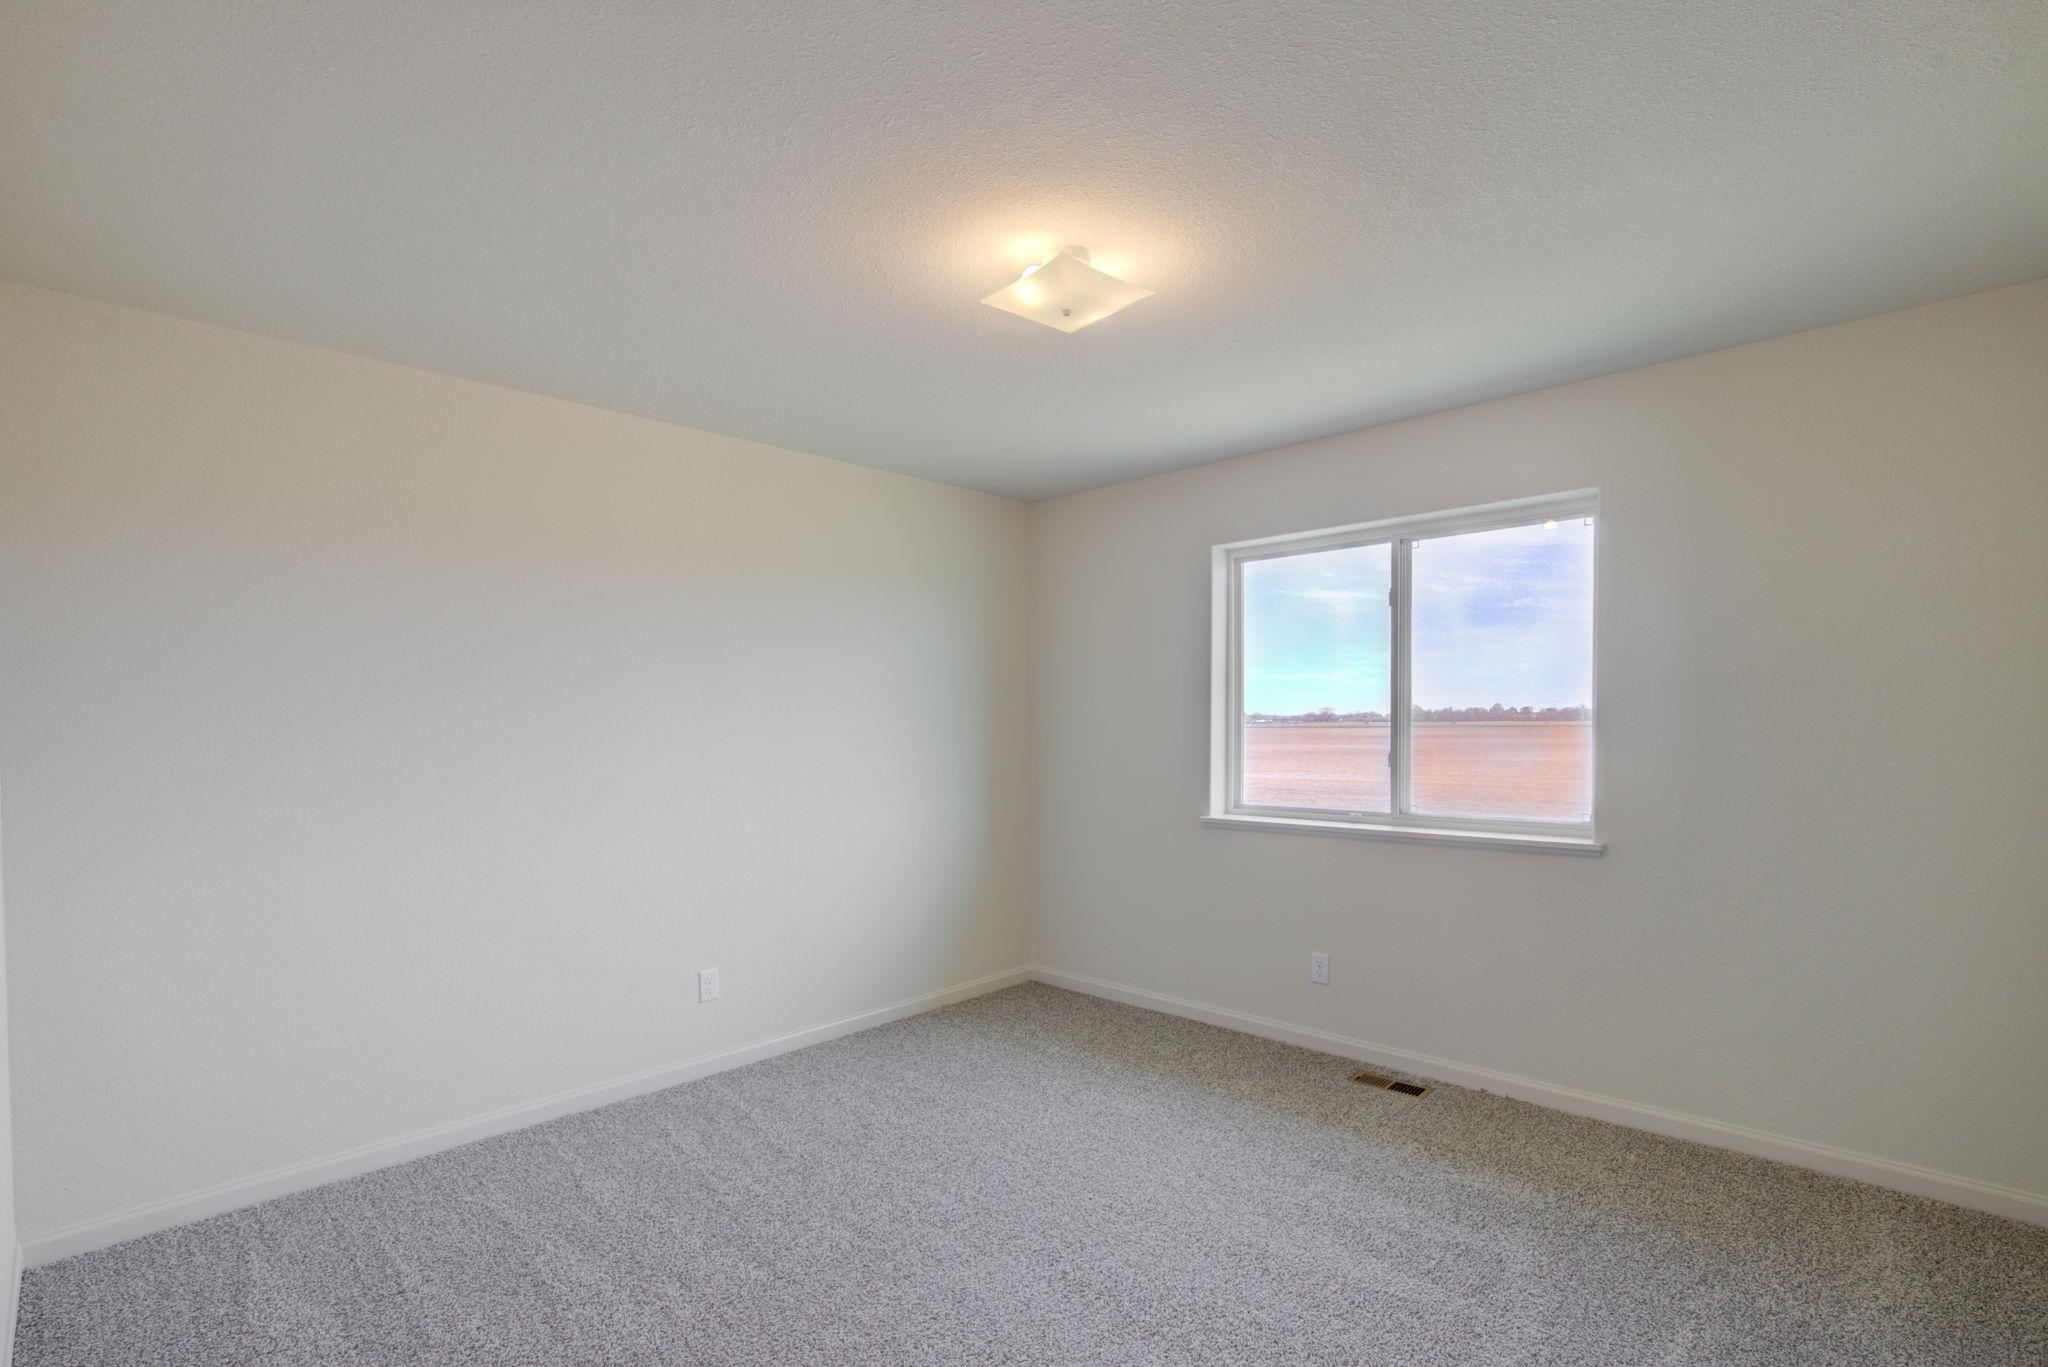 Upstairs- Bedroom 3